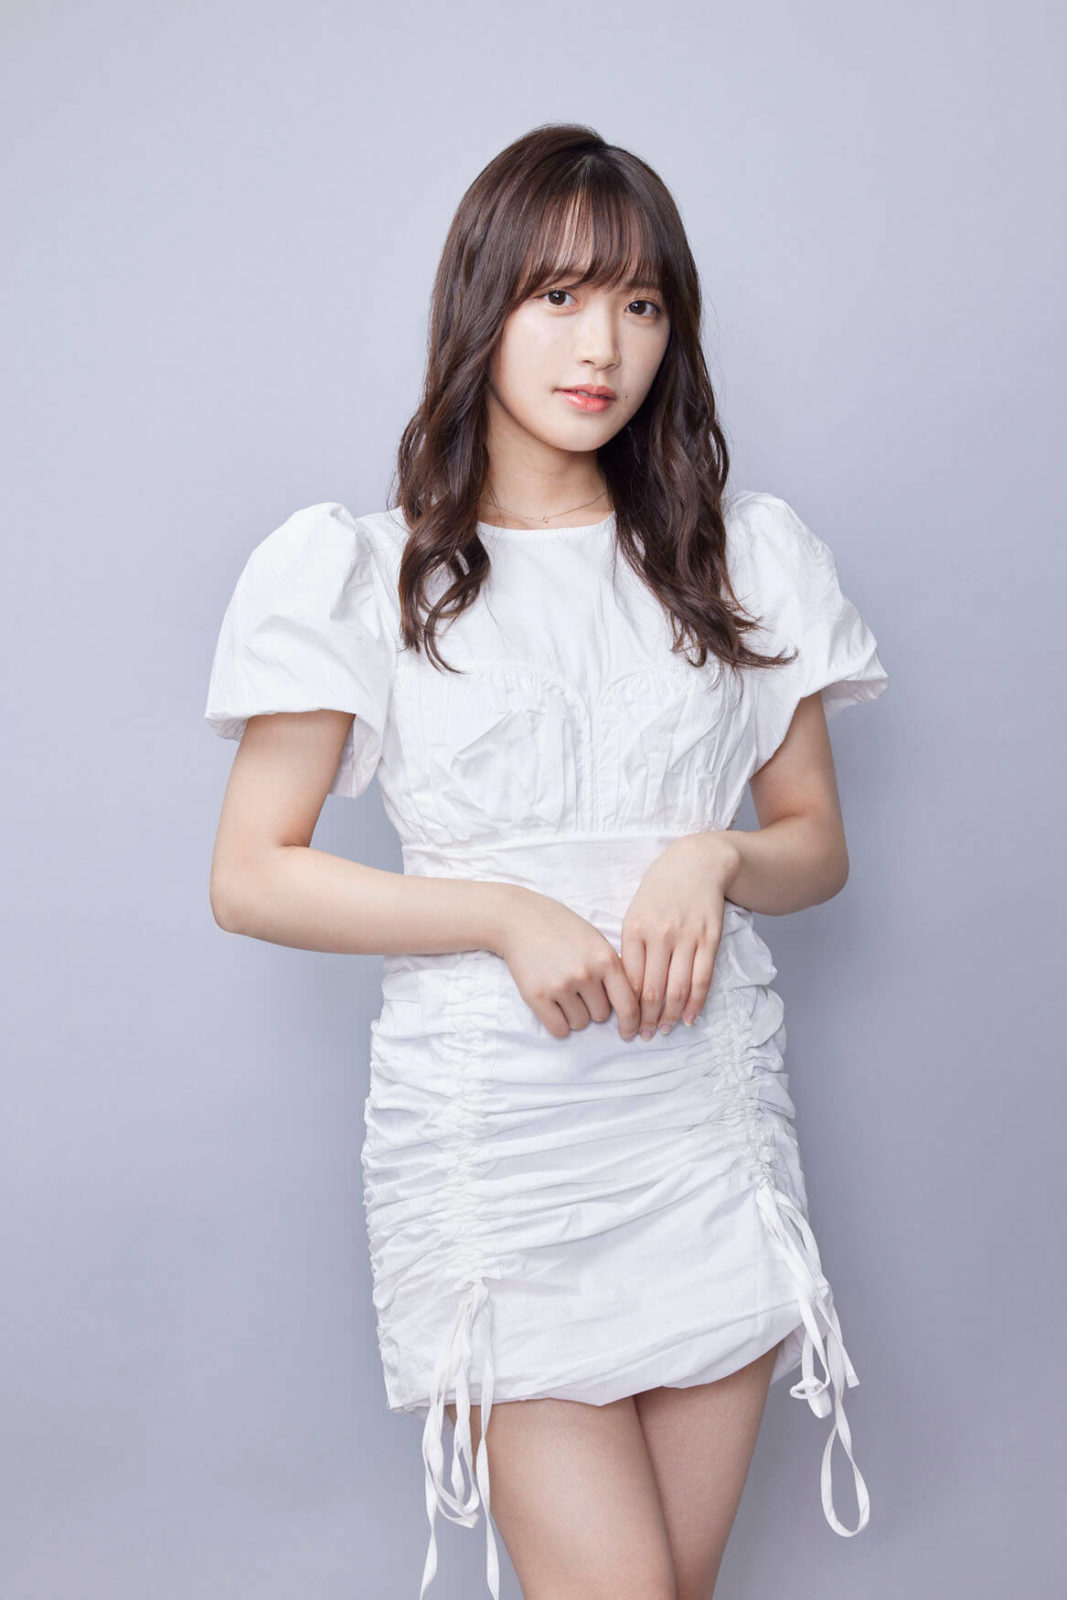 「D4DJ」の新ユニットLyrical Lily・桜田美夢役に大抜擢!反田葉月が語ったこれまでと今後の意気込みサムネイル画像